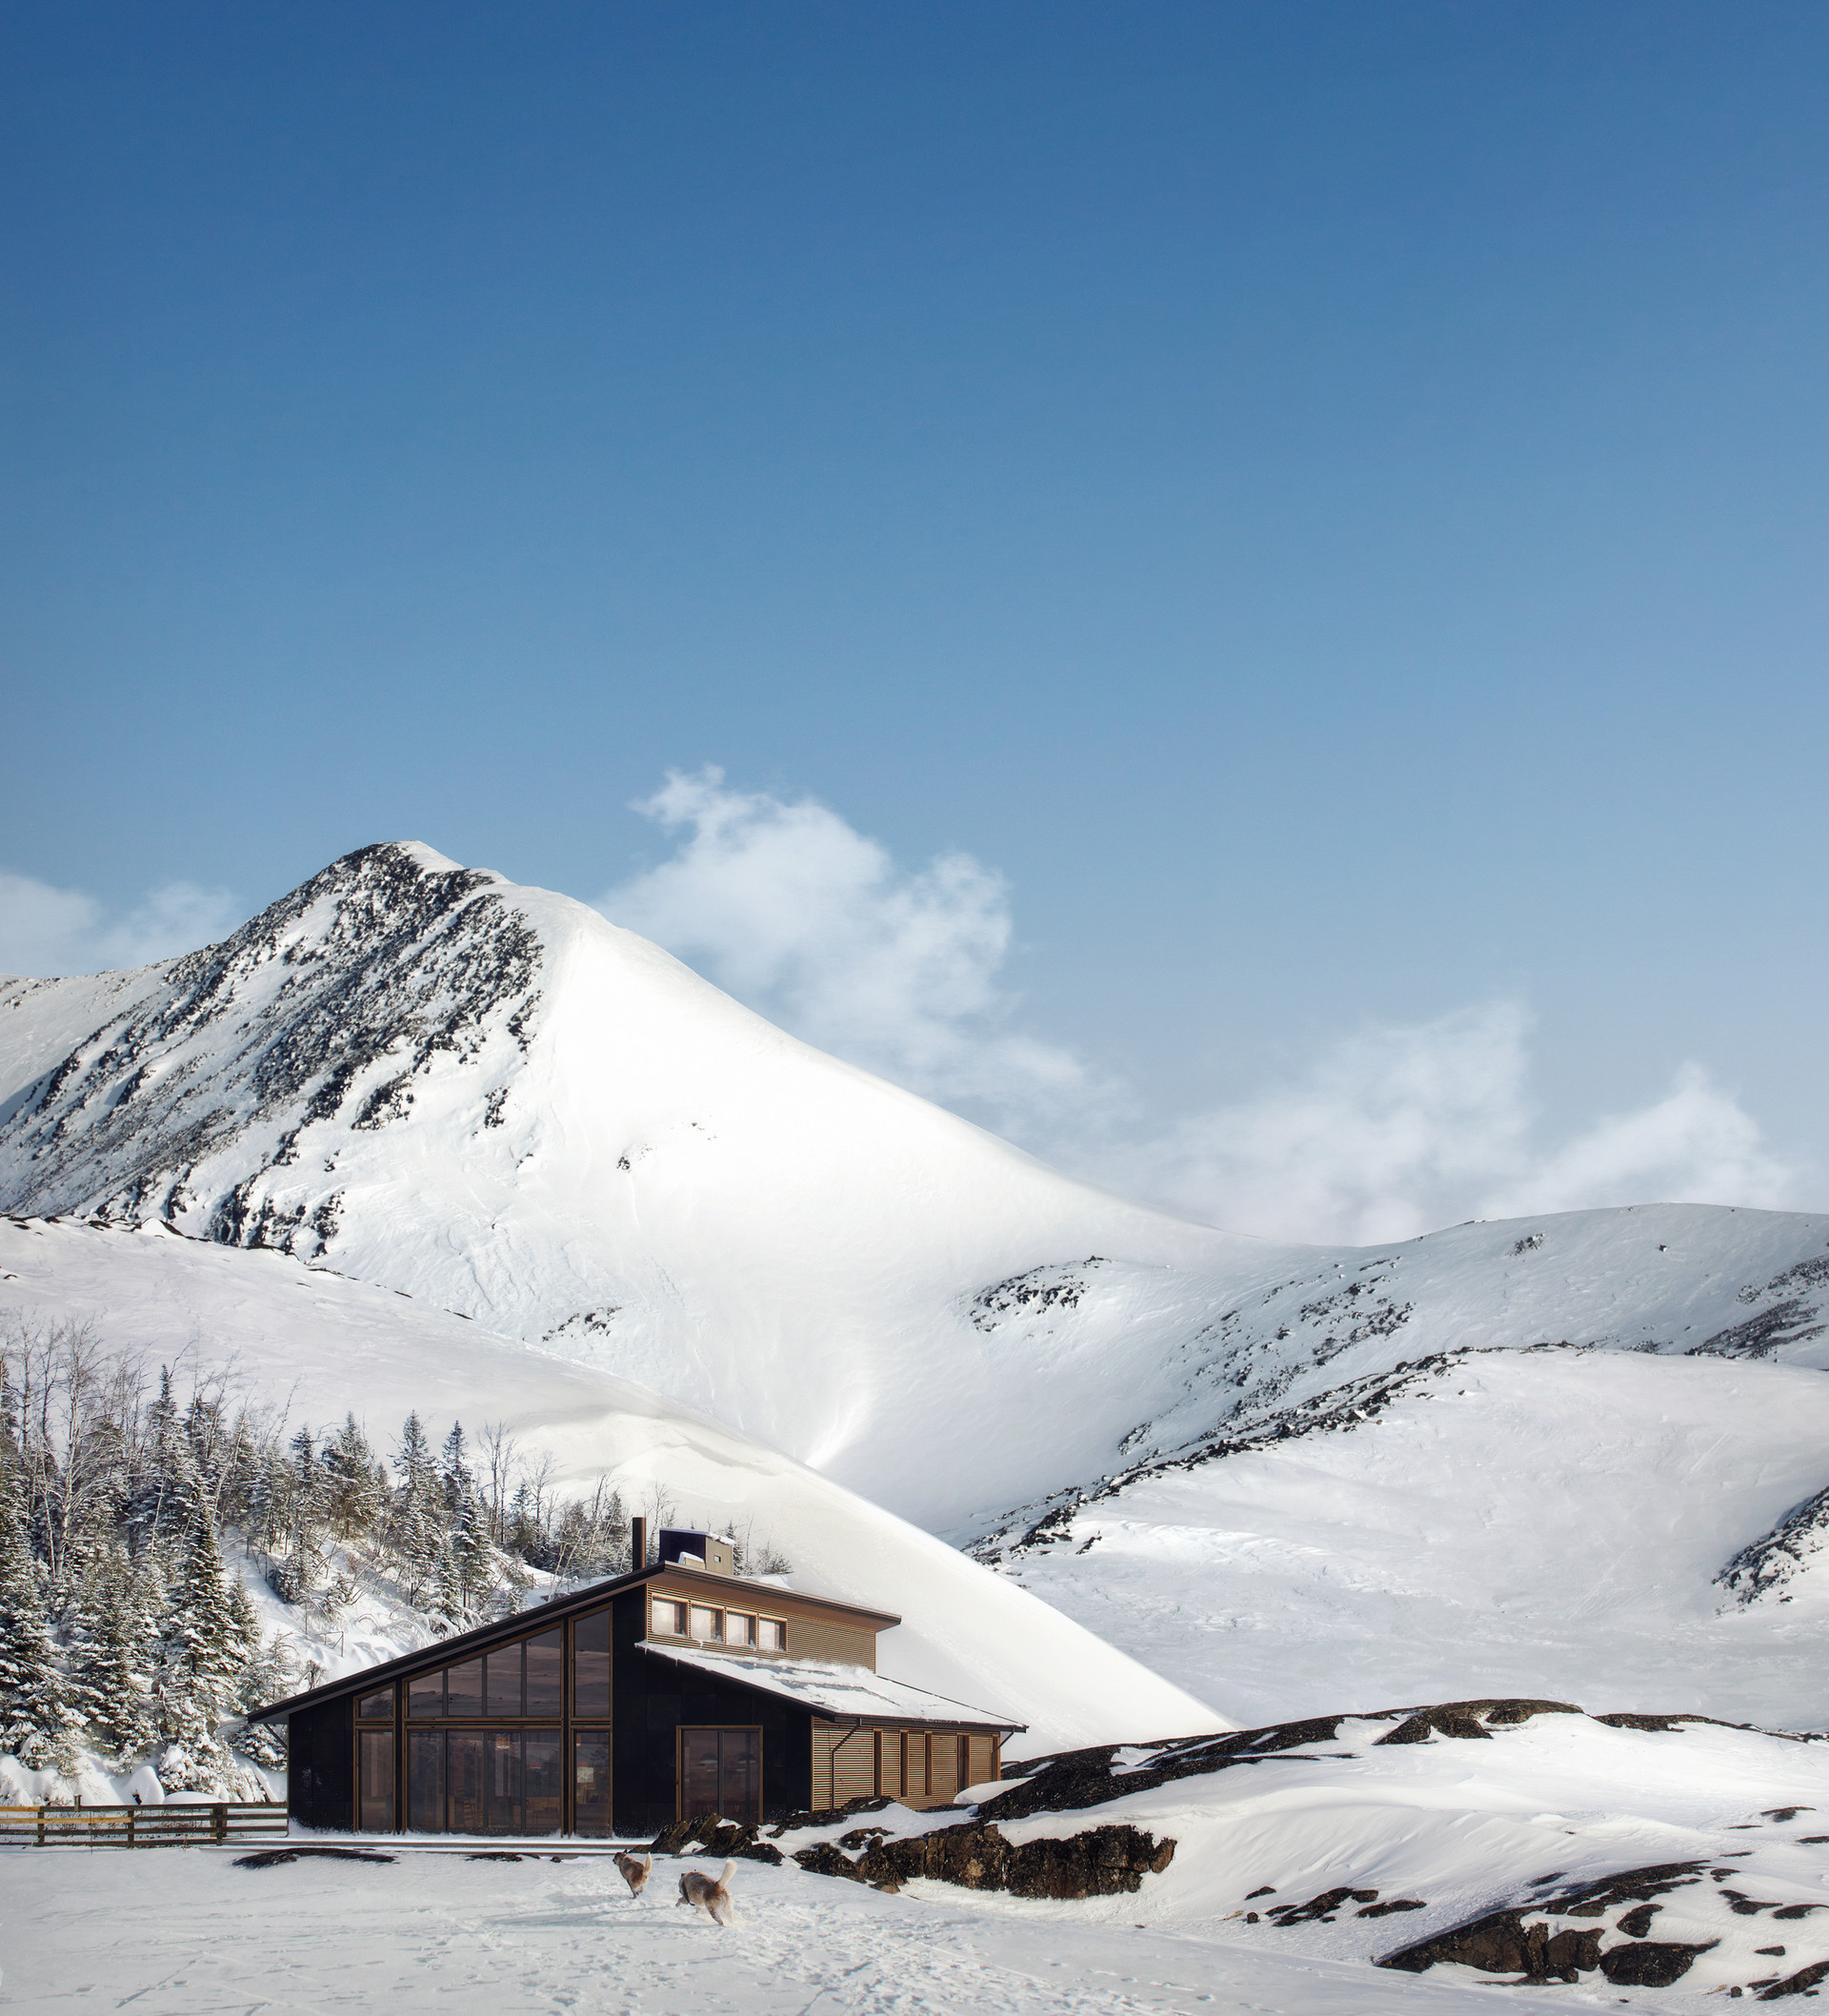 Martin jario artstation martinjario snowy mountains b 2